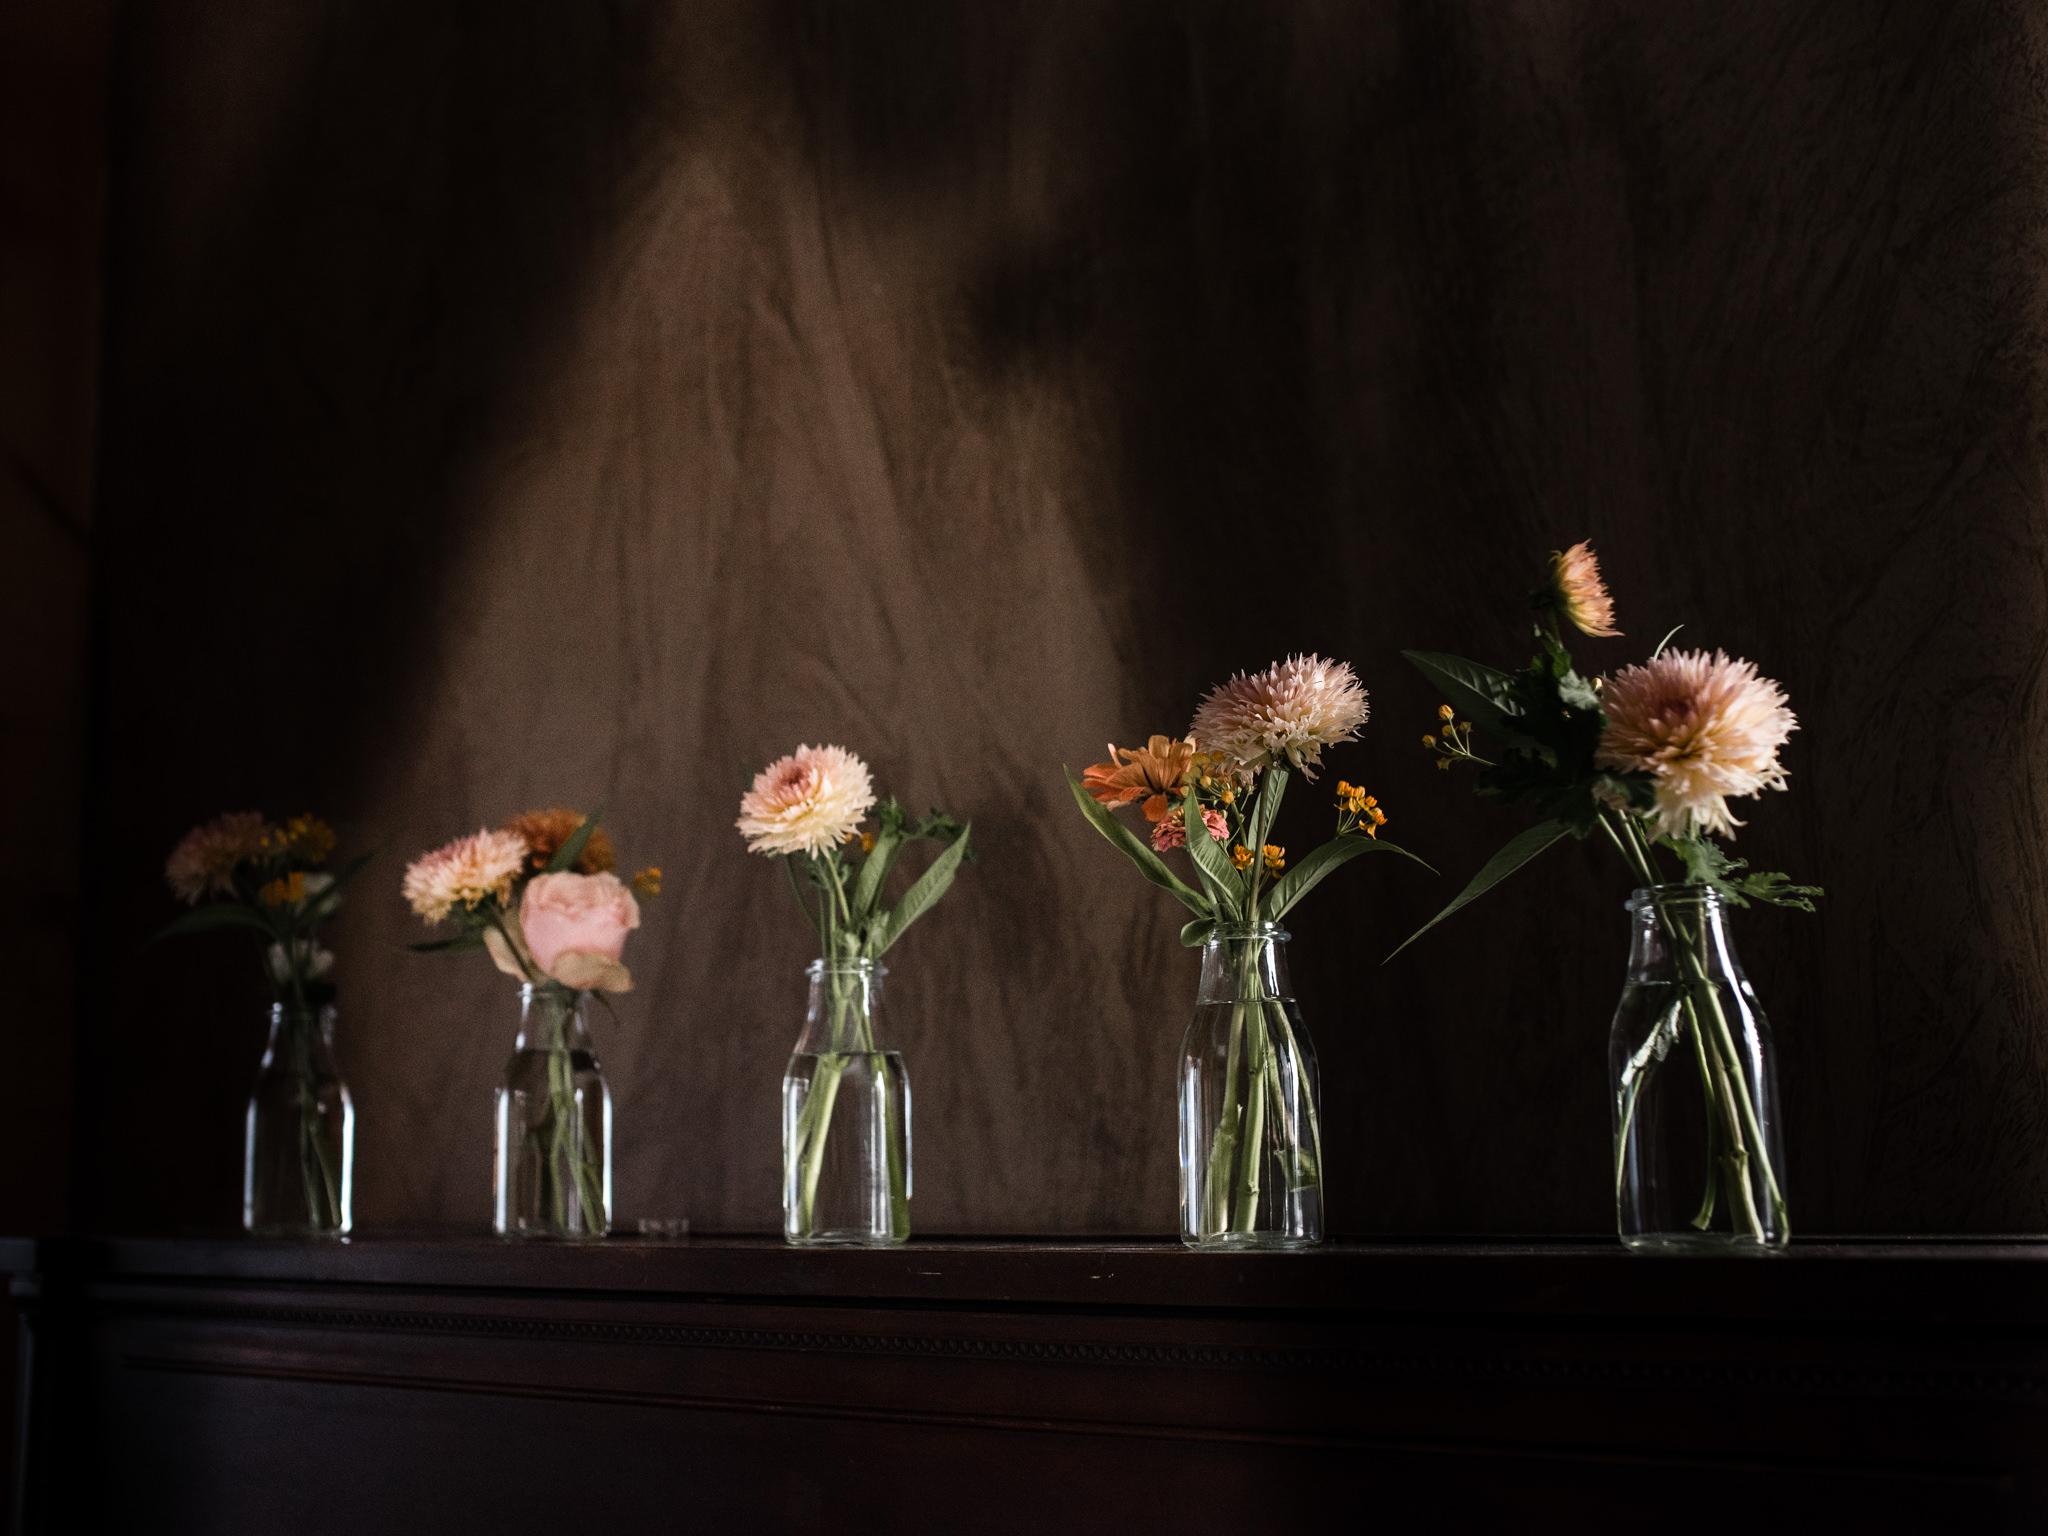 skyloft-wedding-toronto-wedding-photographer-20.jpg